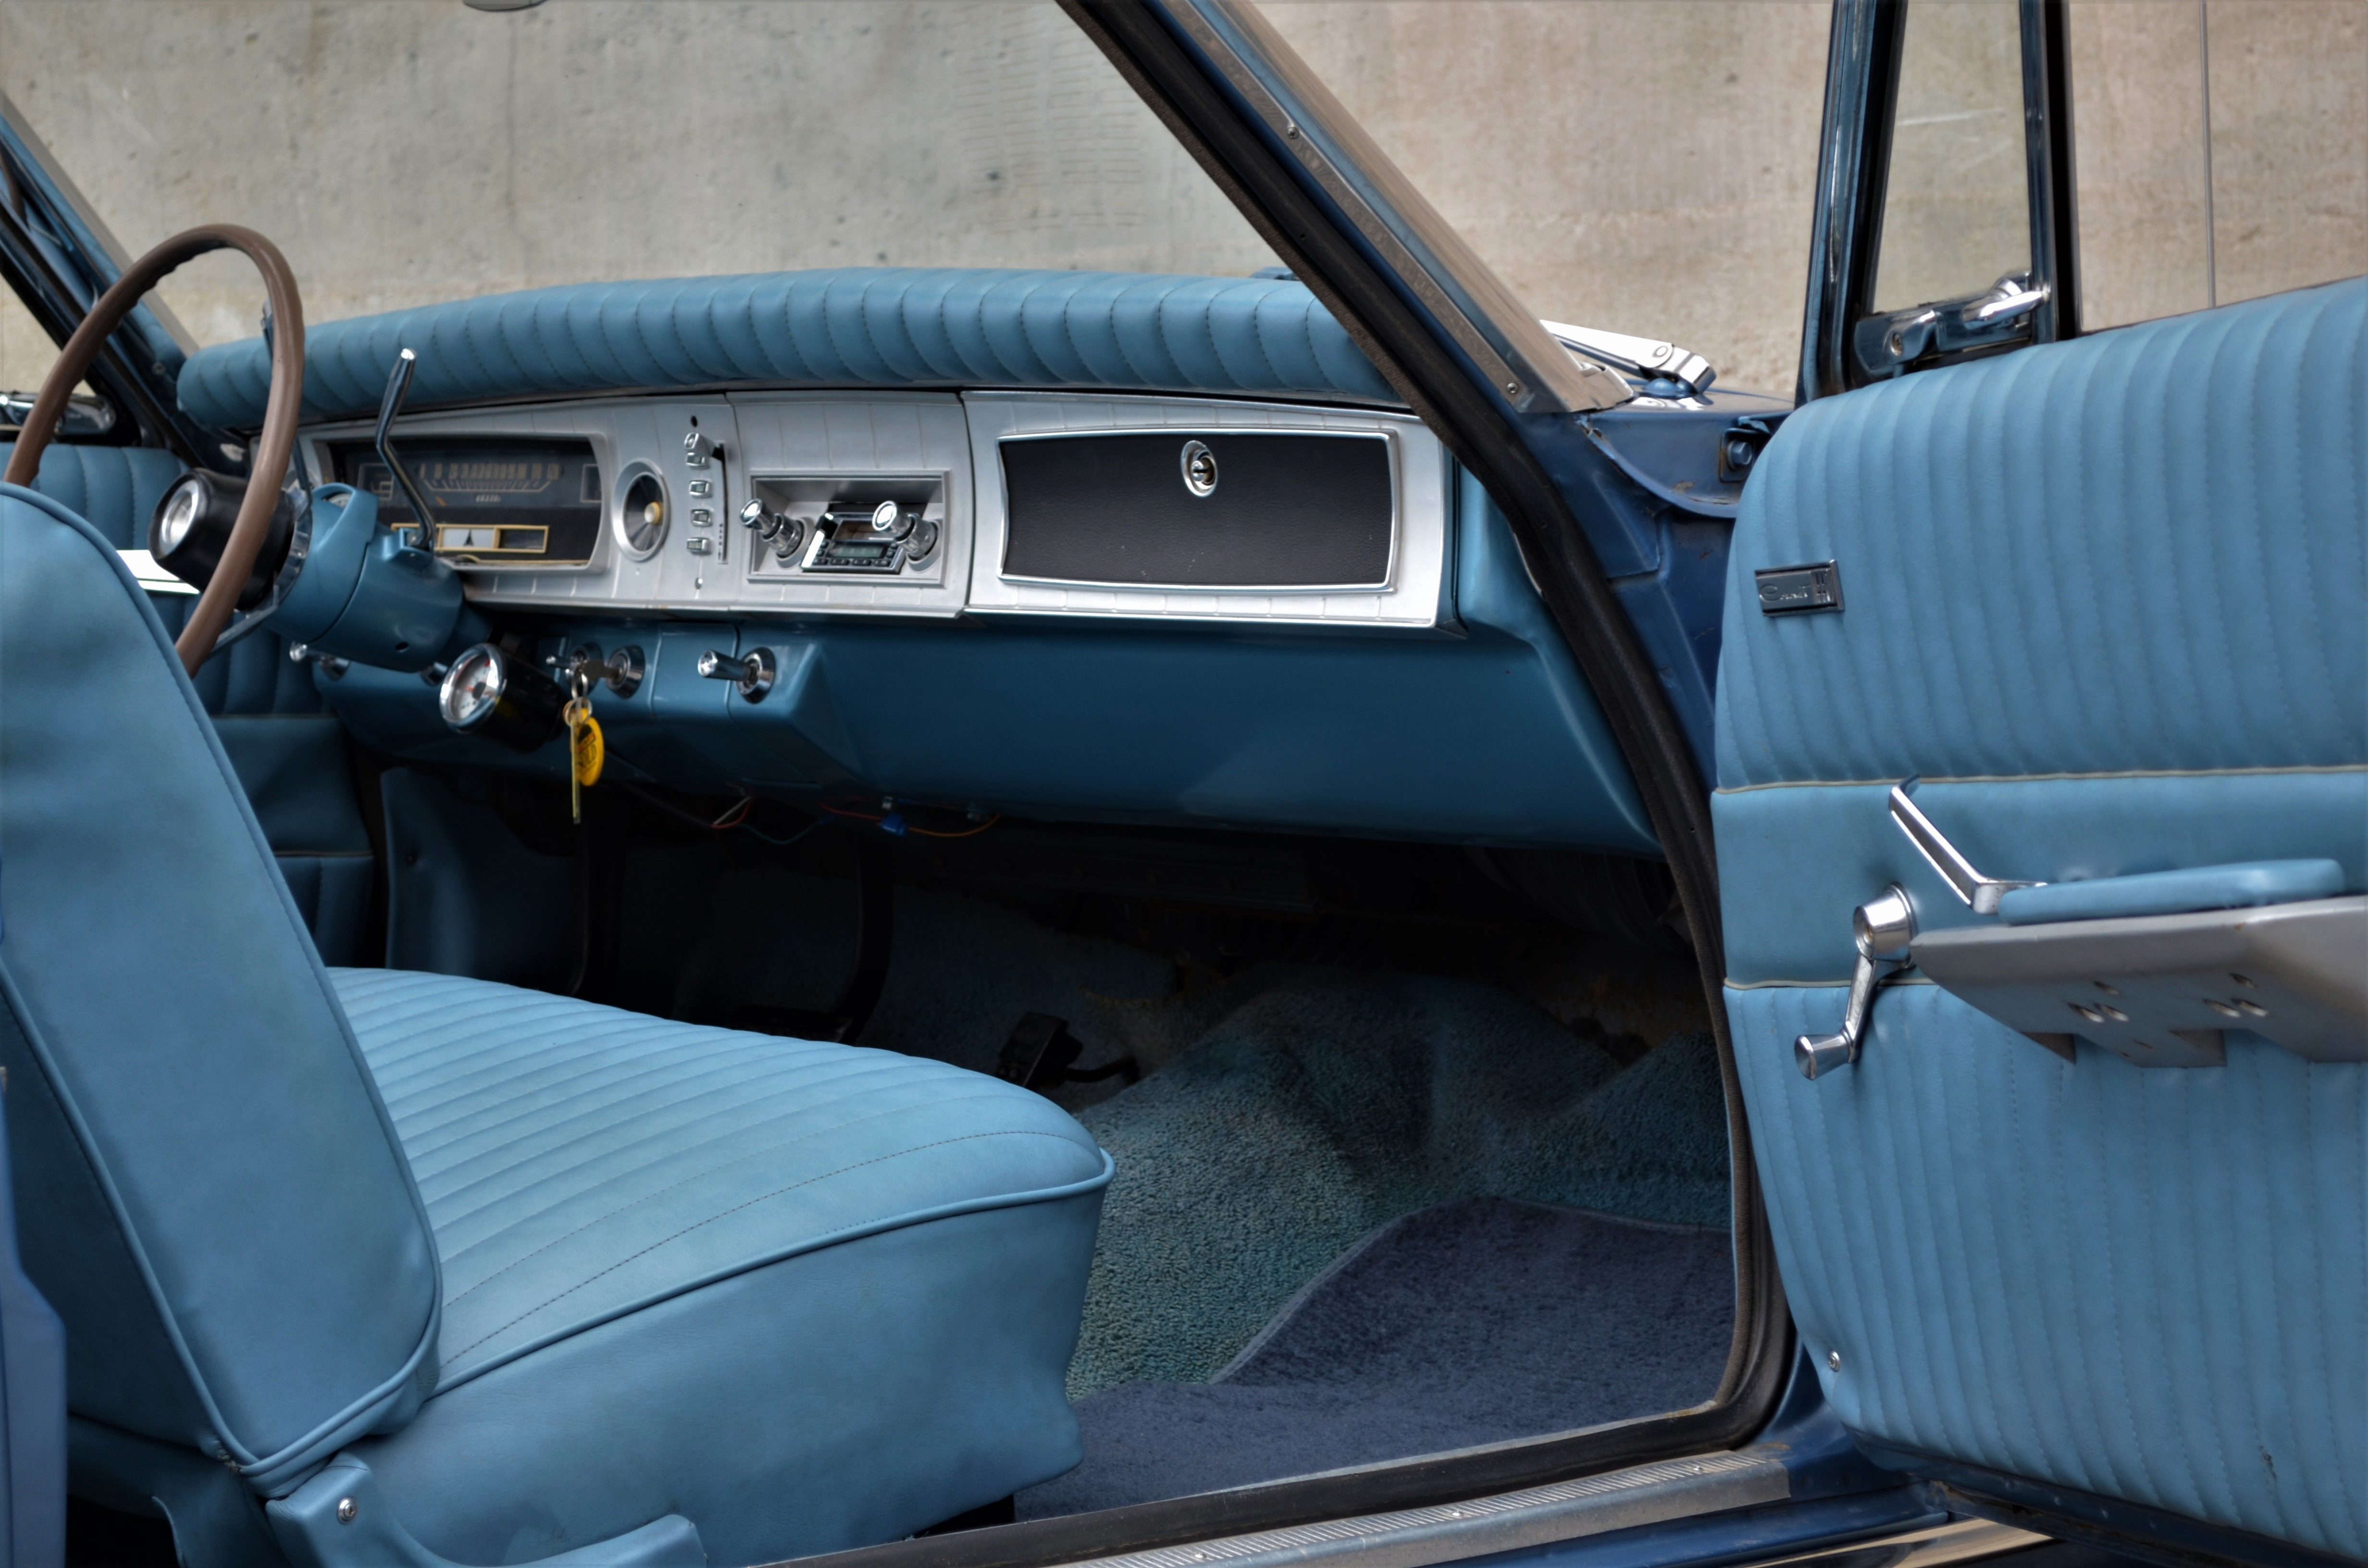 1965 Dodge Coronet 440 American Classic Rides